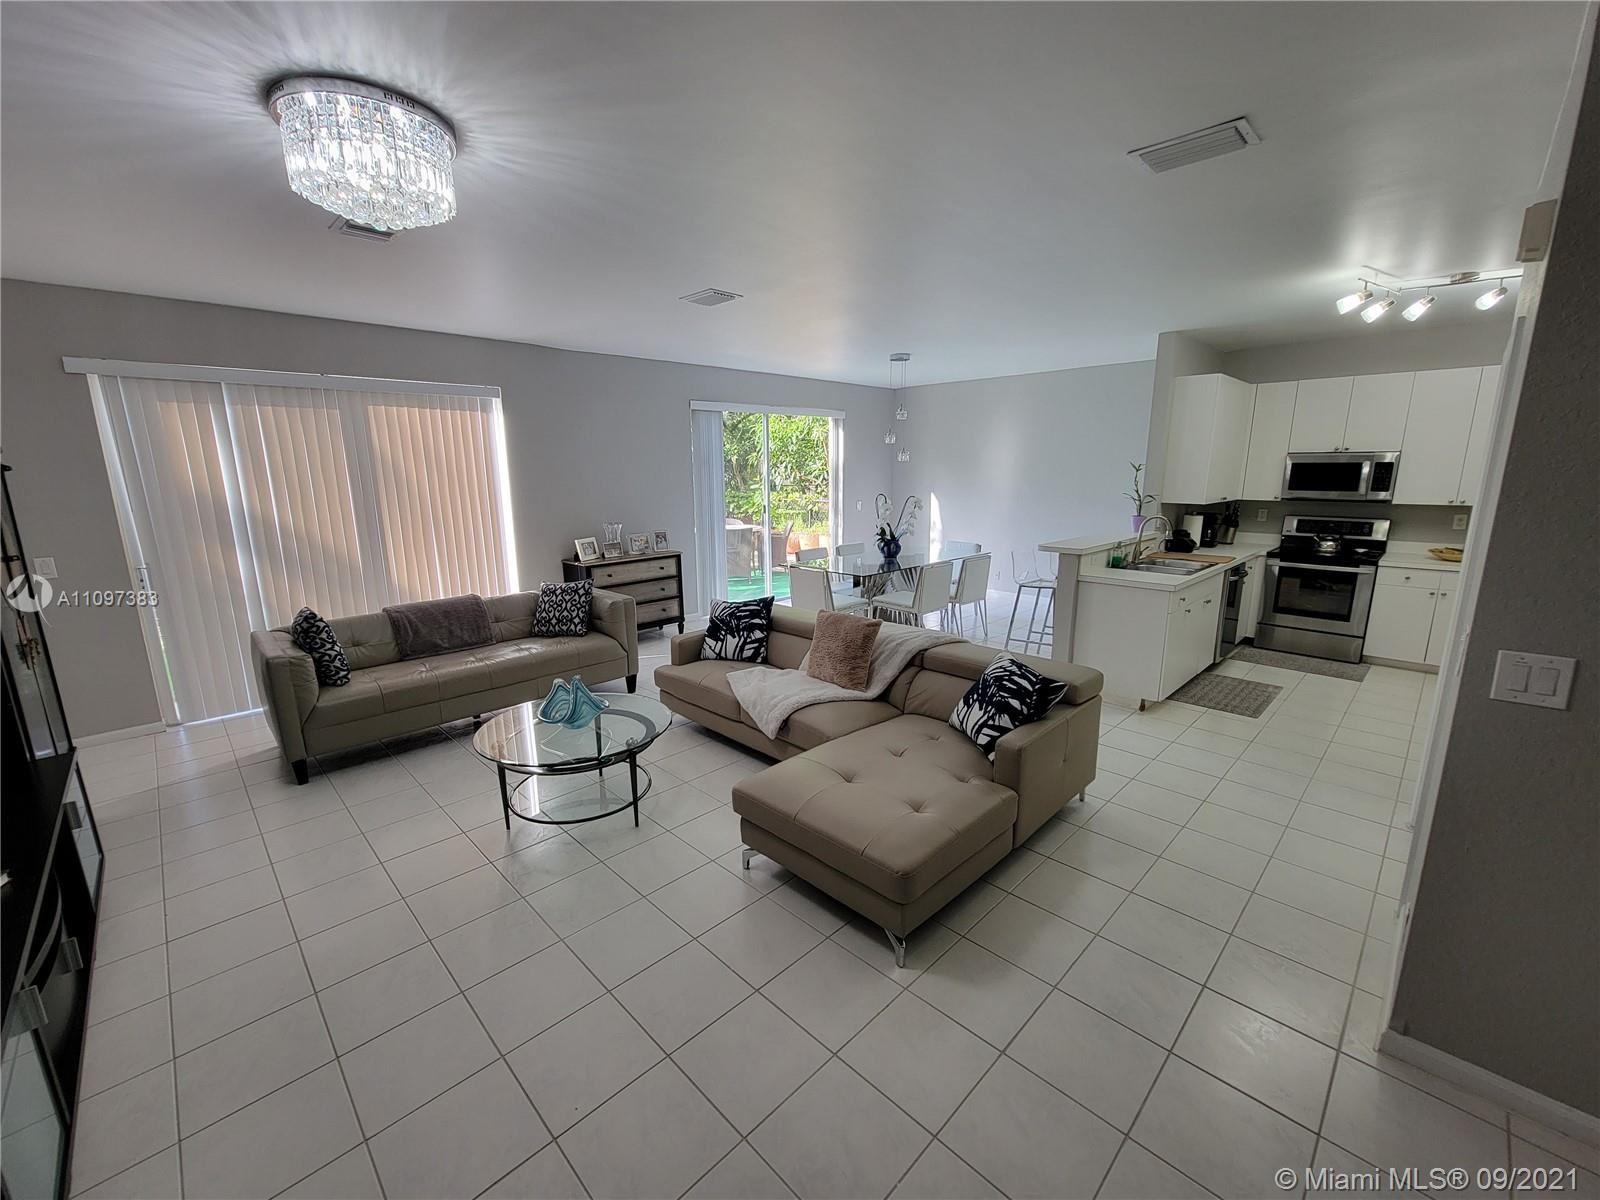 5311 Eagle Cay Way, Coconut Creek, FL 33073 - #: A11097383